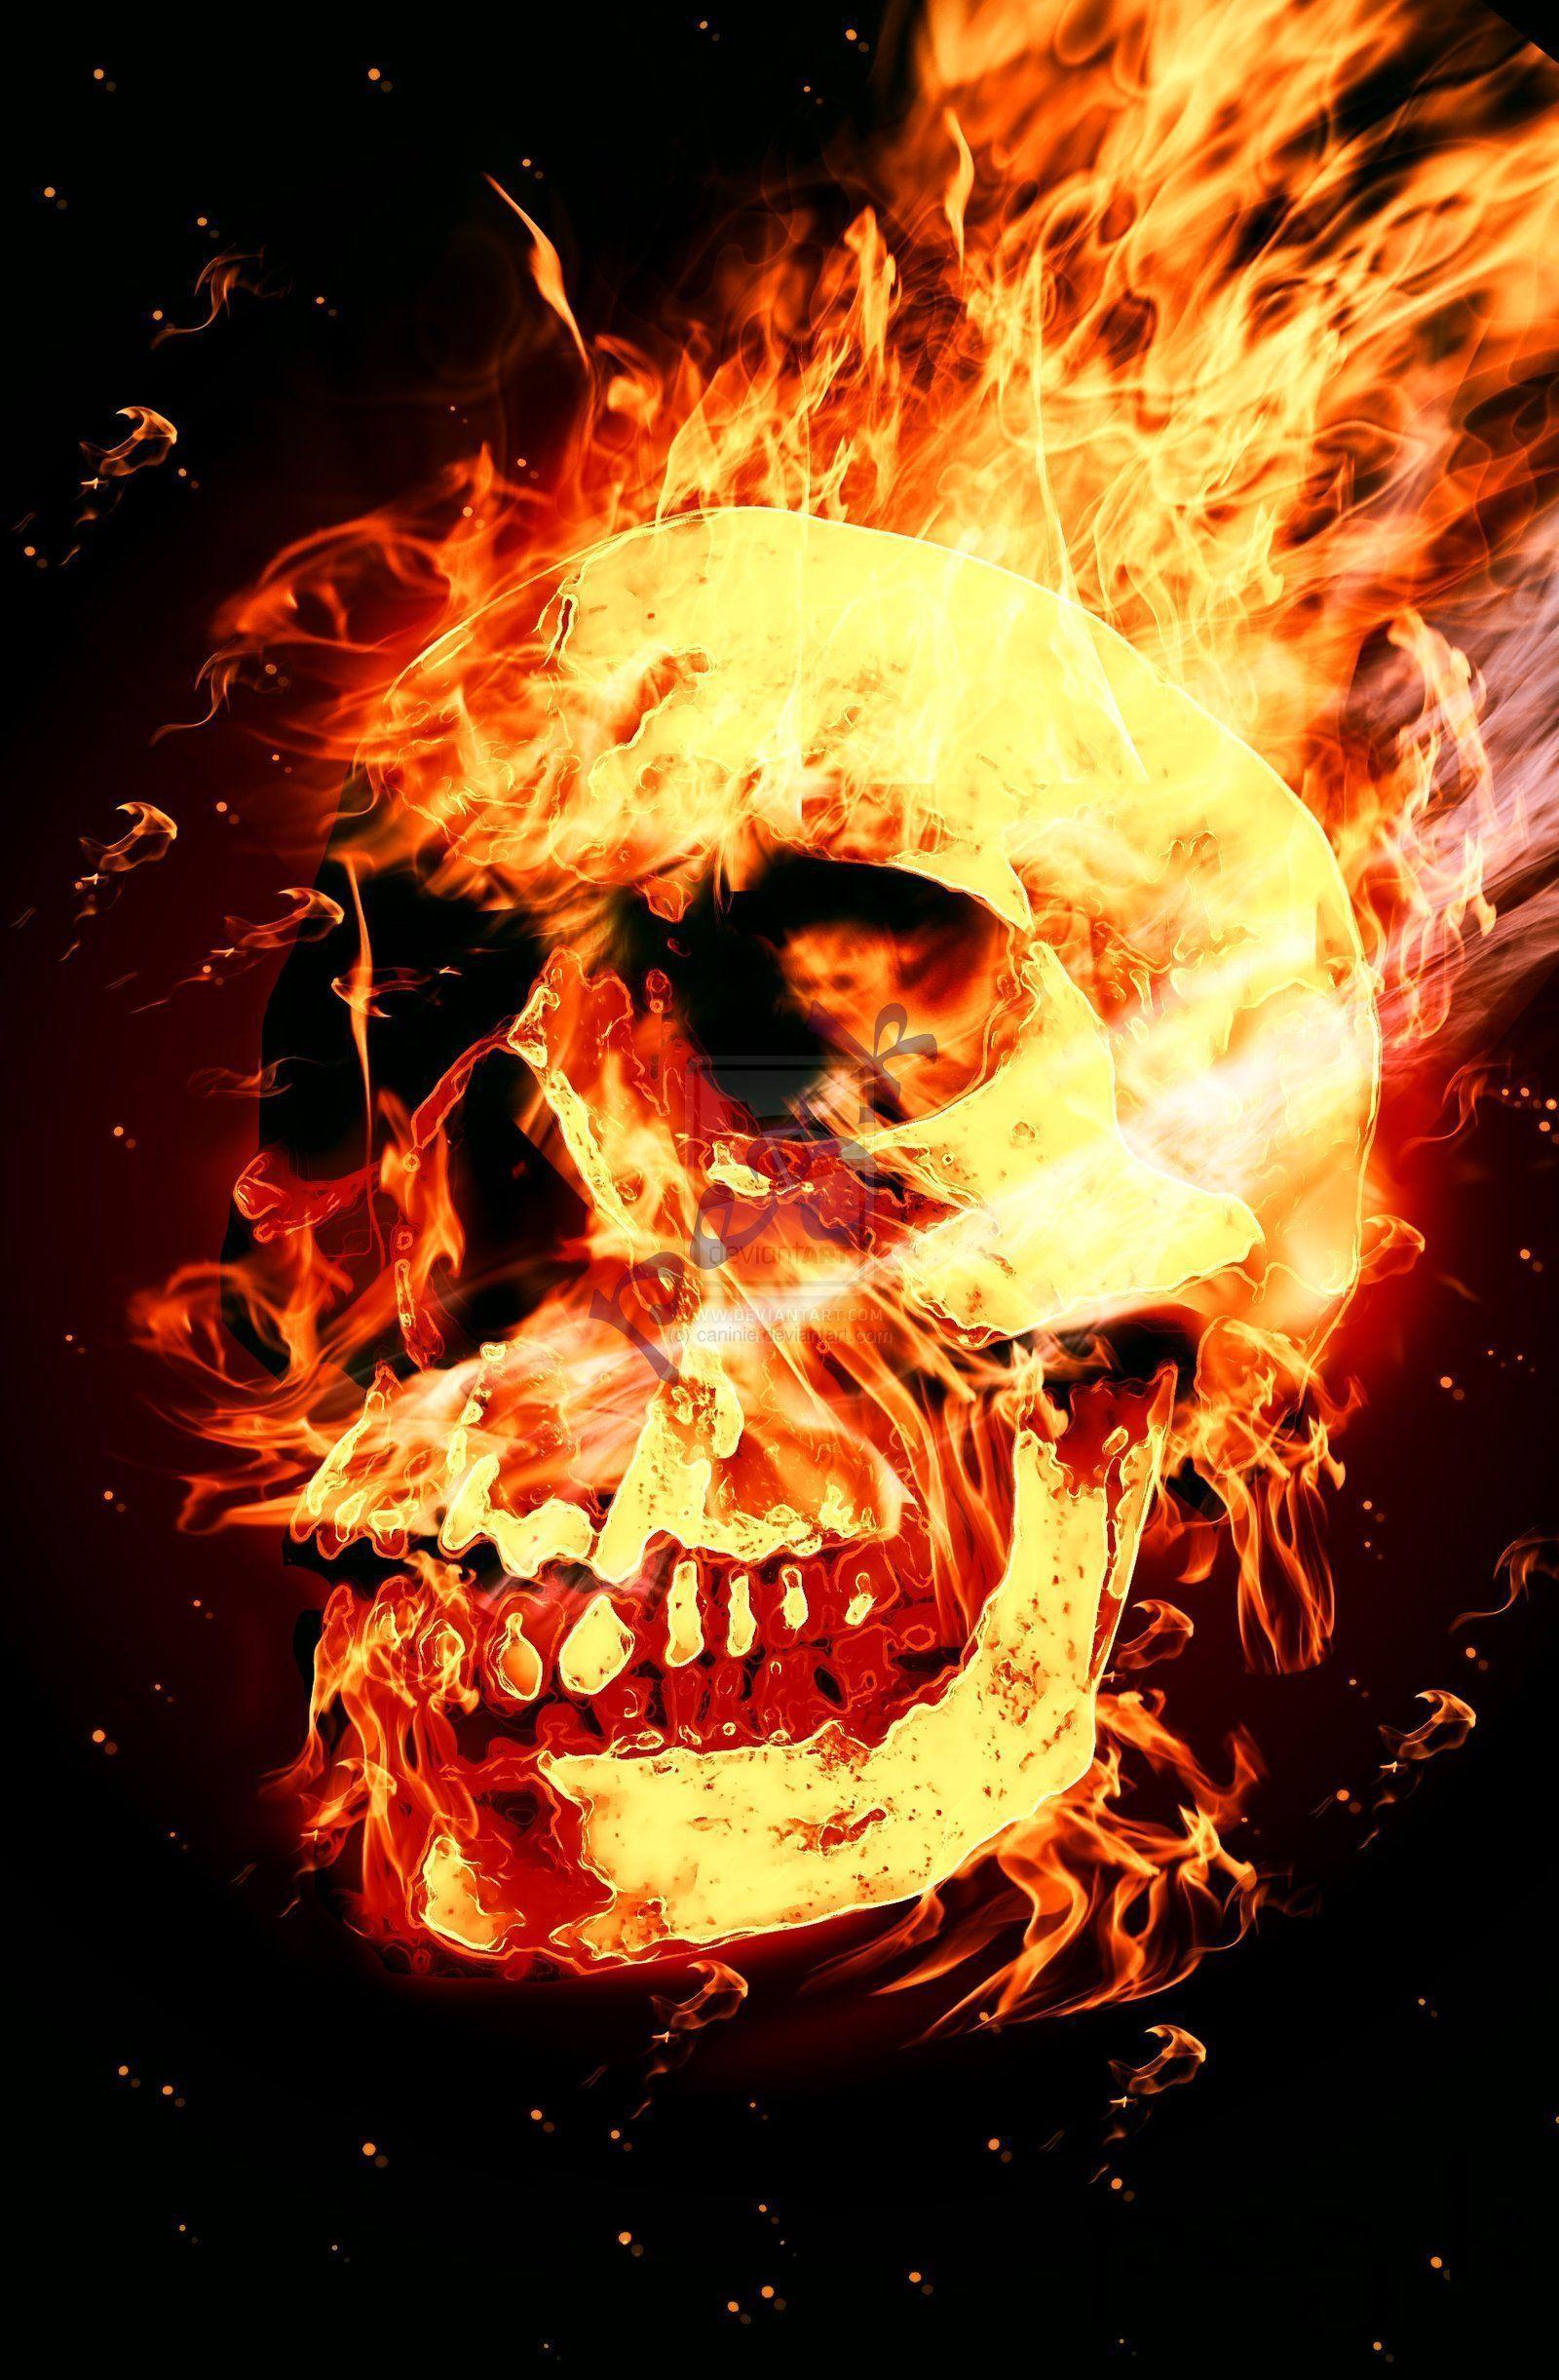 skulls on fire wallpapers wallpaper cave